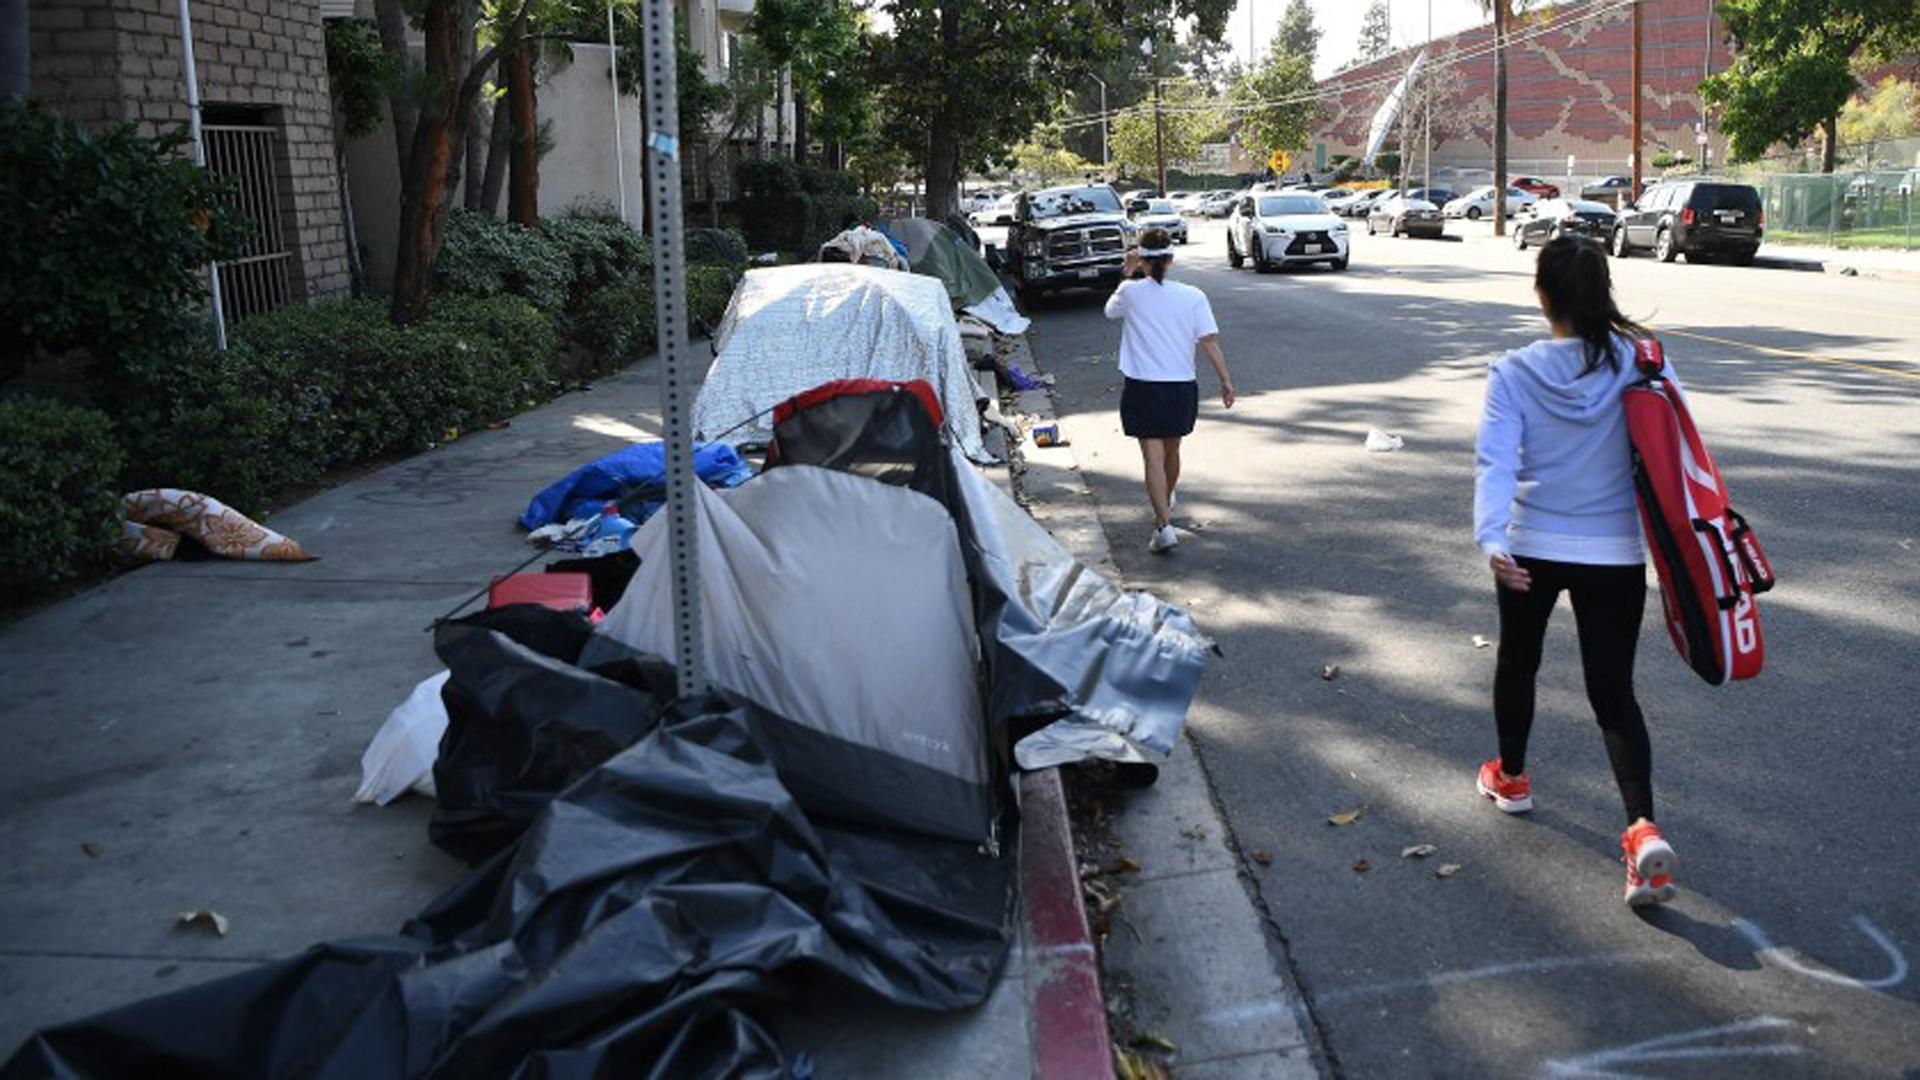 Tents line a sidewalk in Los Angeles.(Credit: Wally Skalij / Los Angeles Times)